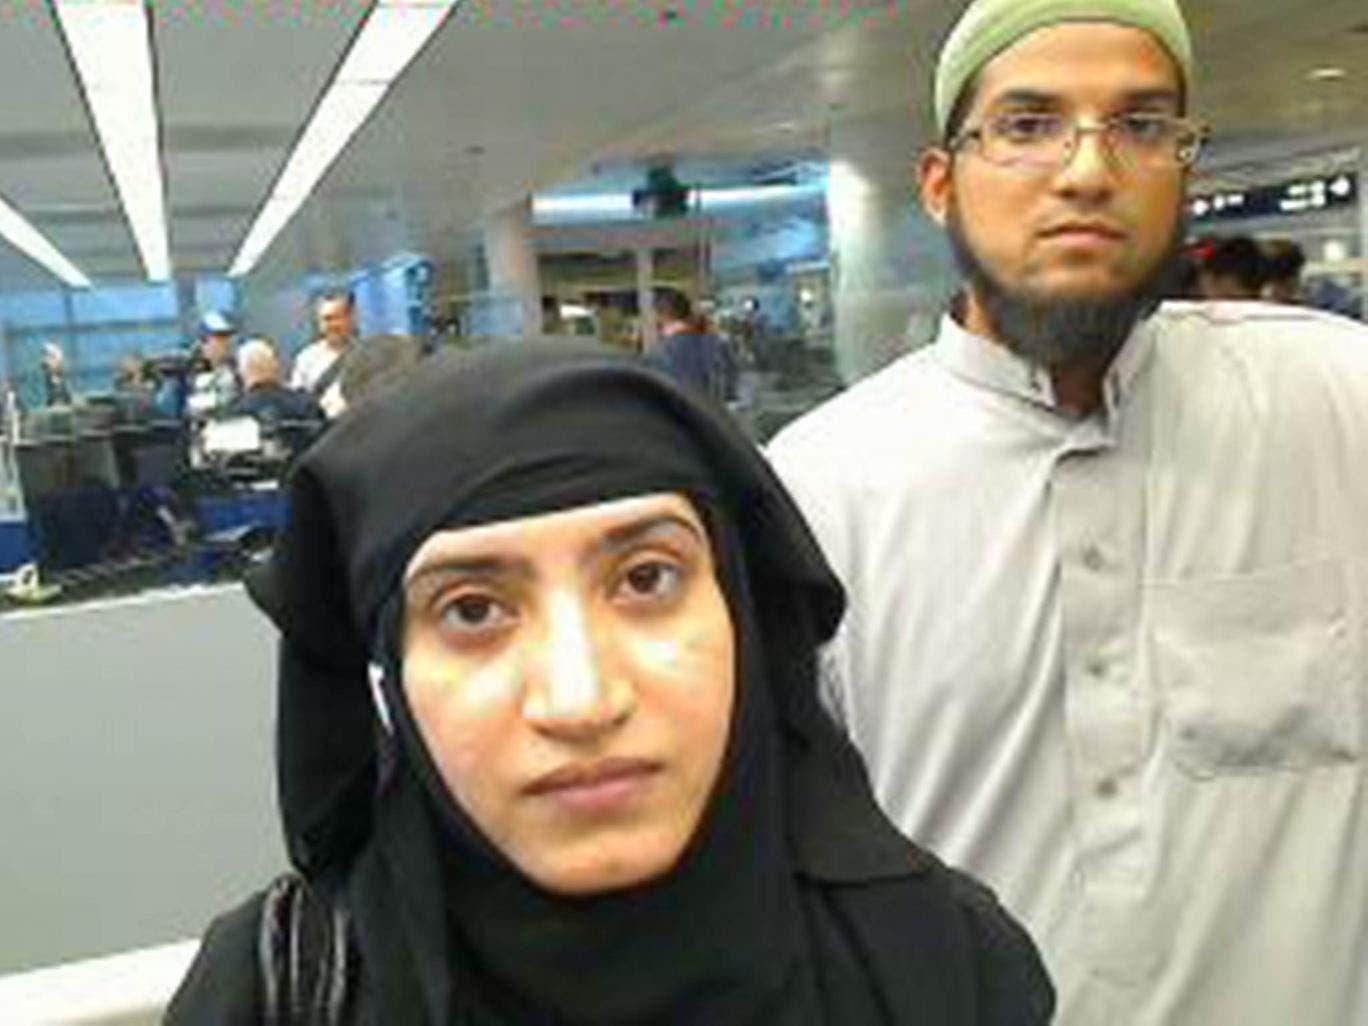 San Bernardino shooters Tashfeen Malik and Syed Farook. (Reuters)